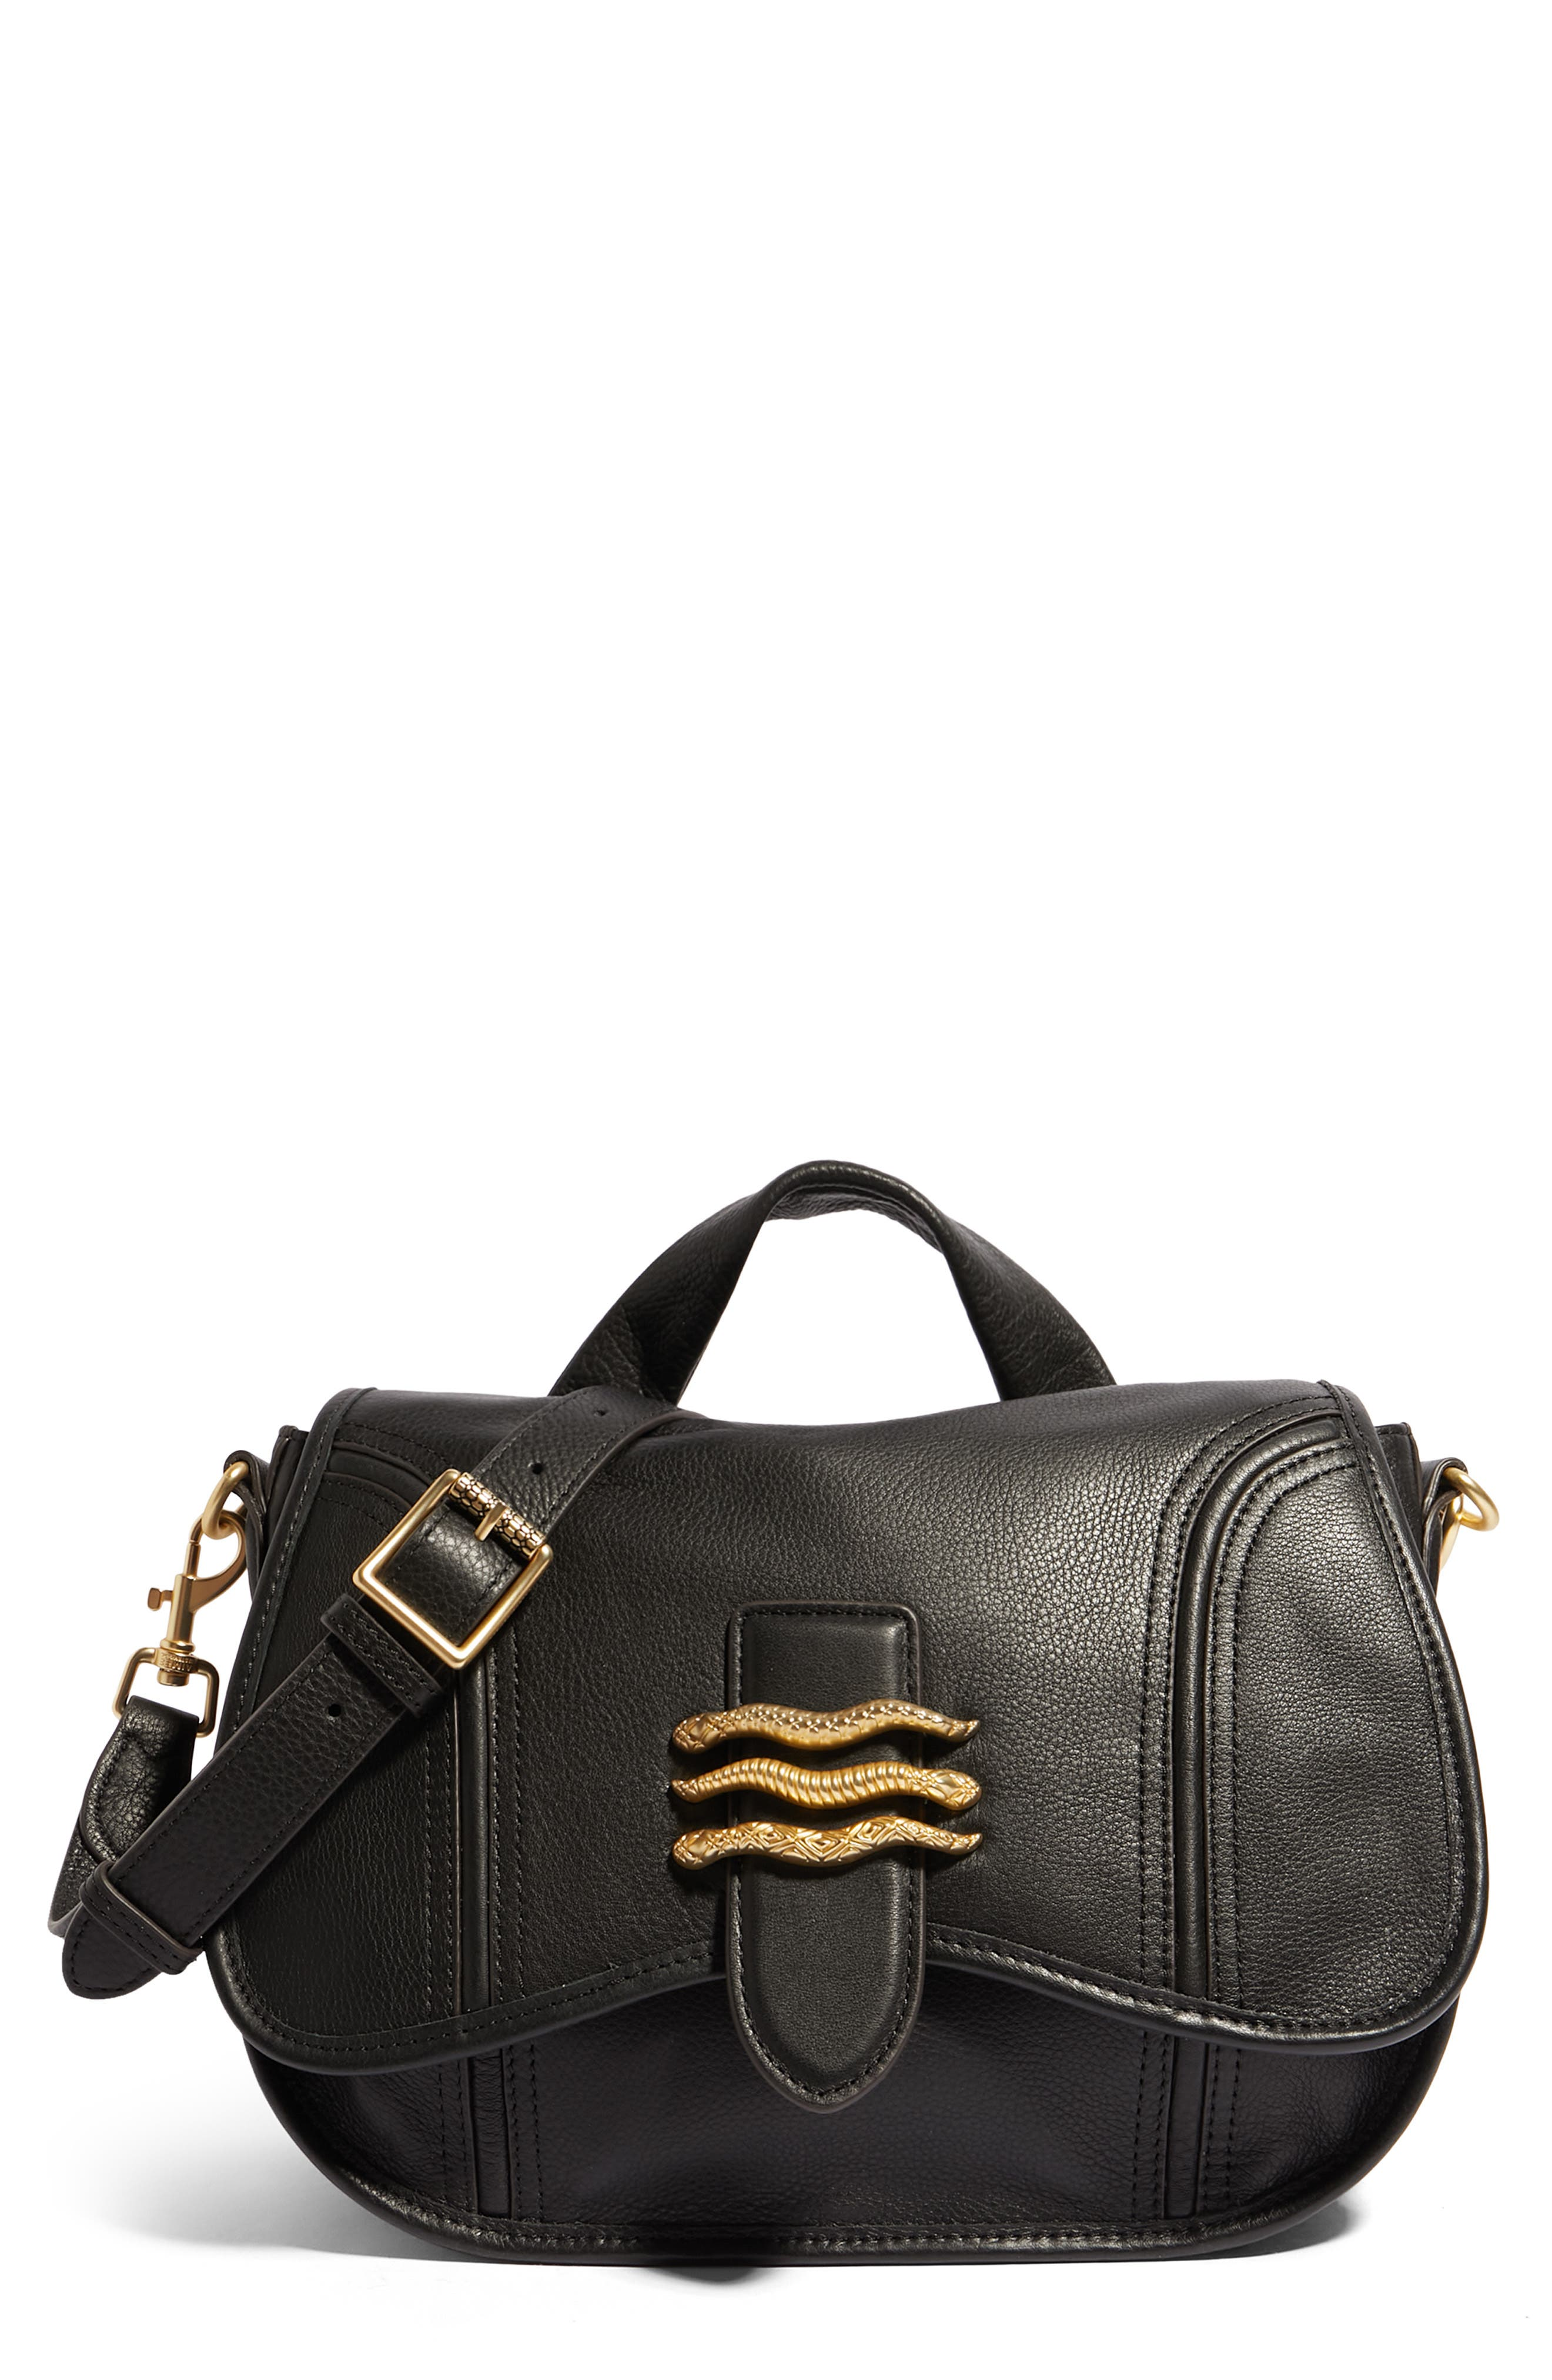 Fierce & Fab Leather Saddle Bag